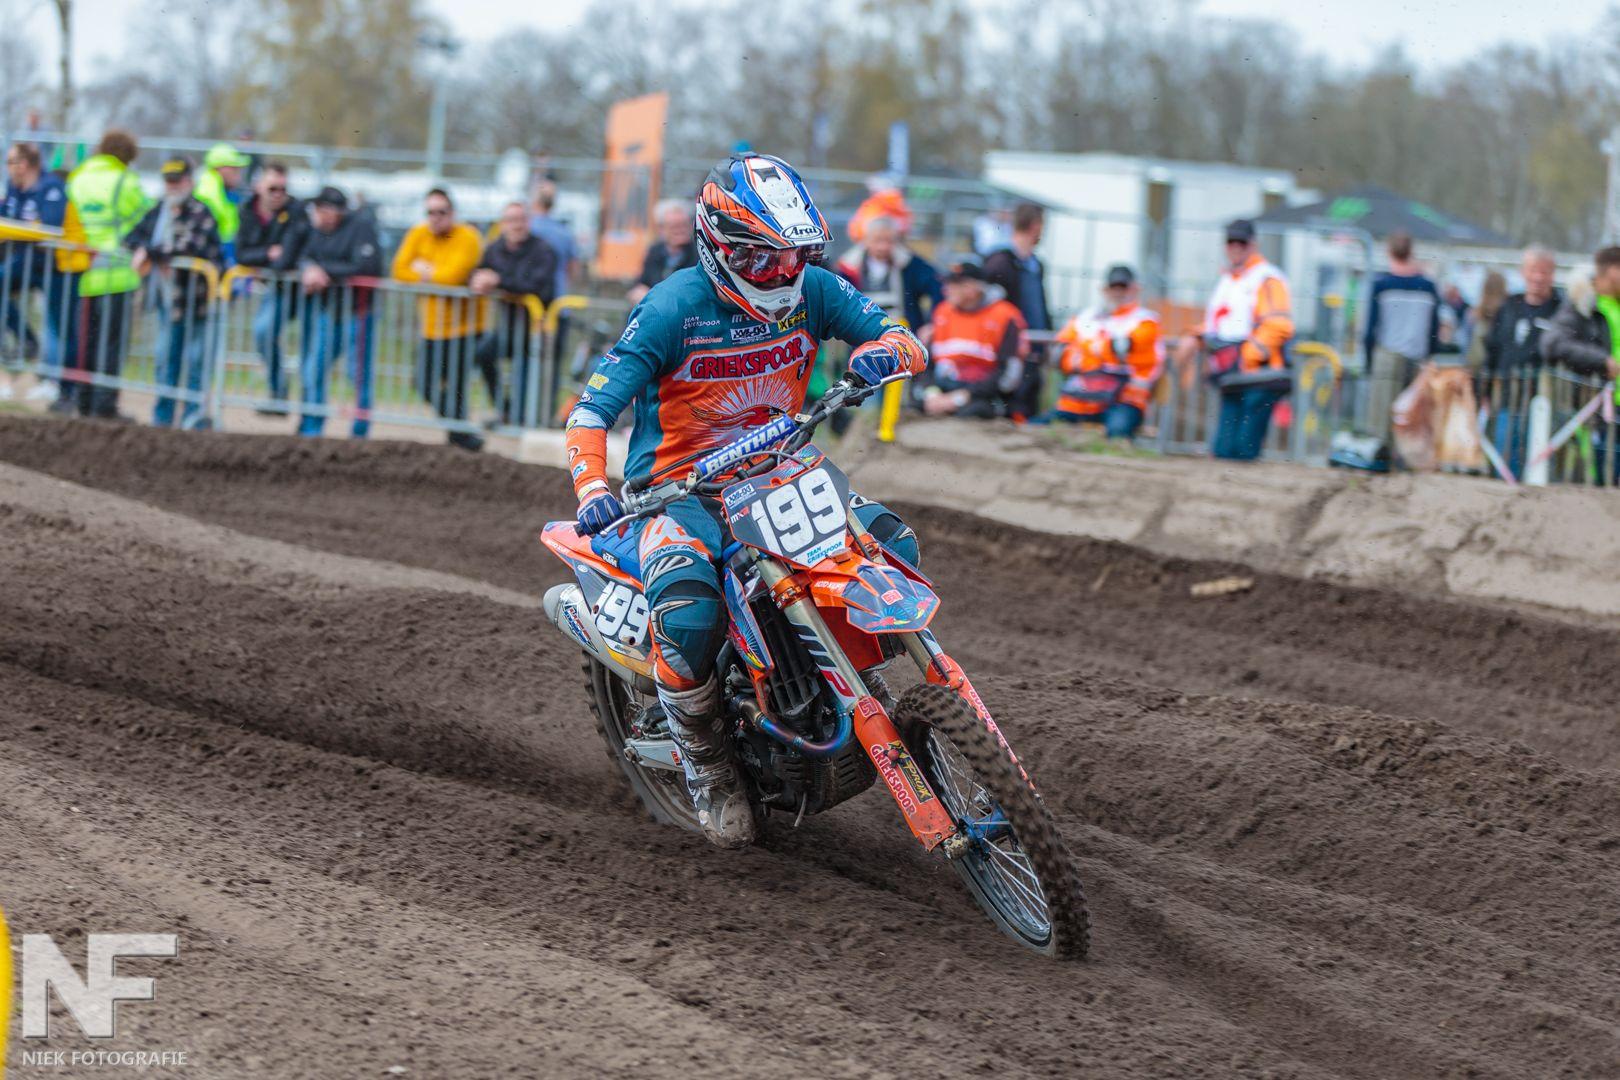 Lars op Motocross GP 2019 Valkenswaard